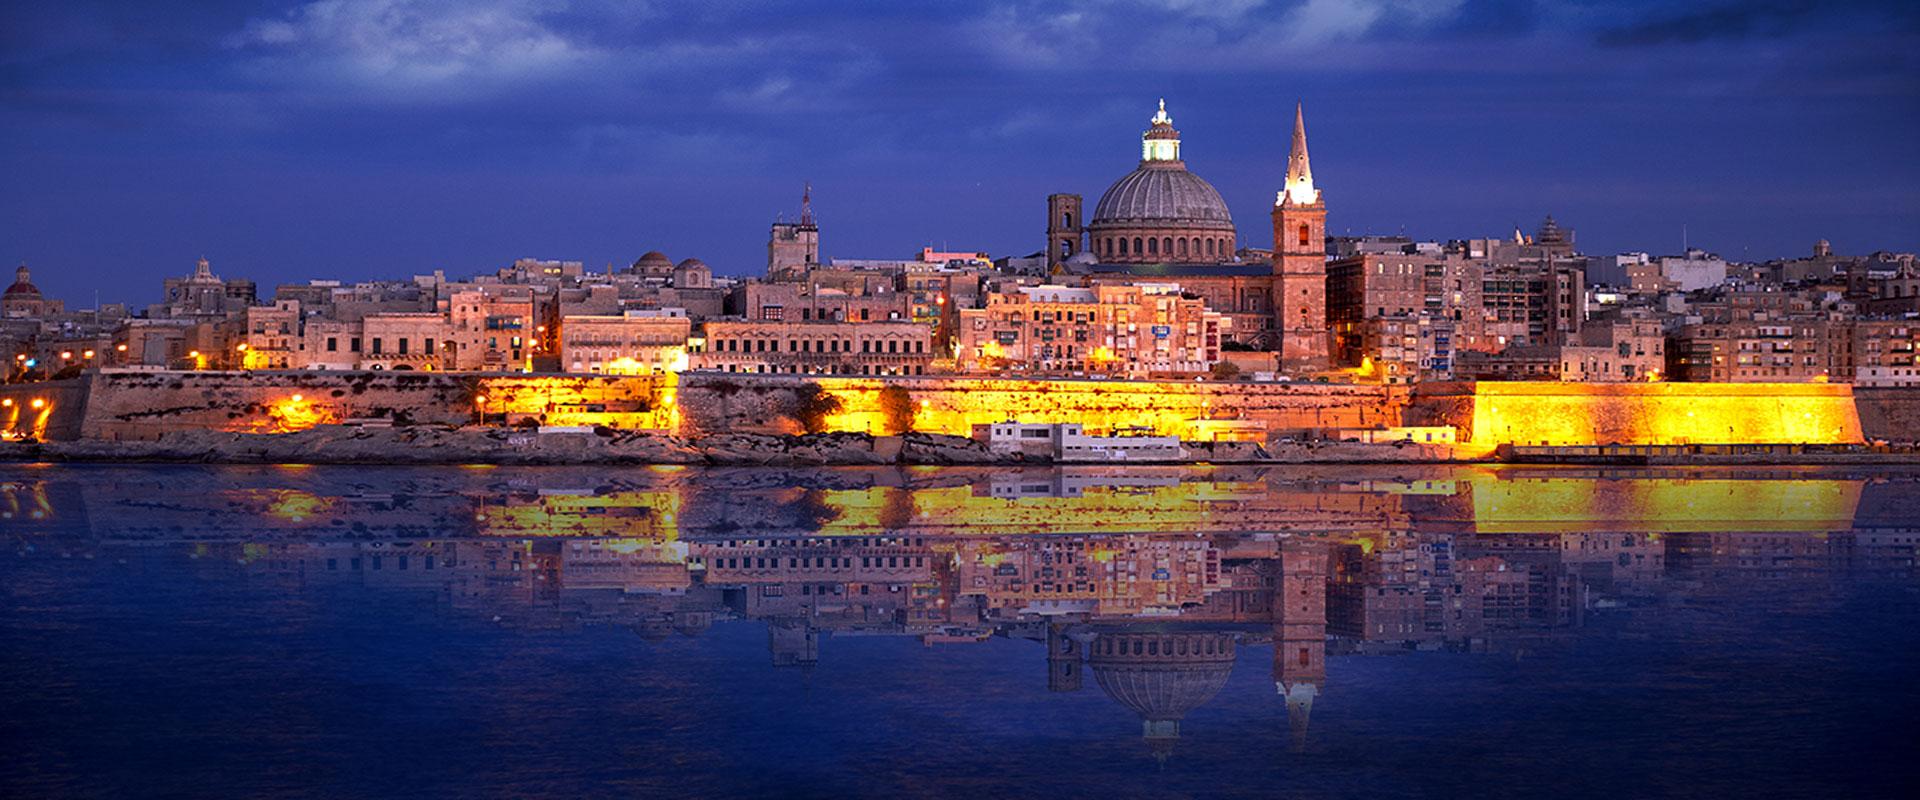 Malta Citizenship Program passes EURO 1 billion in revenue